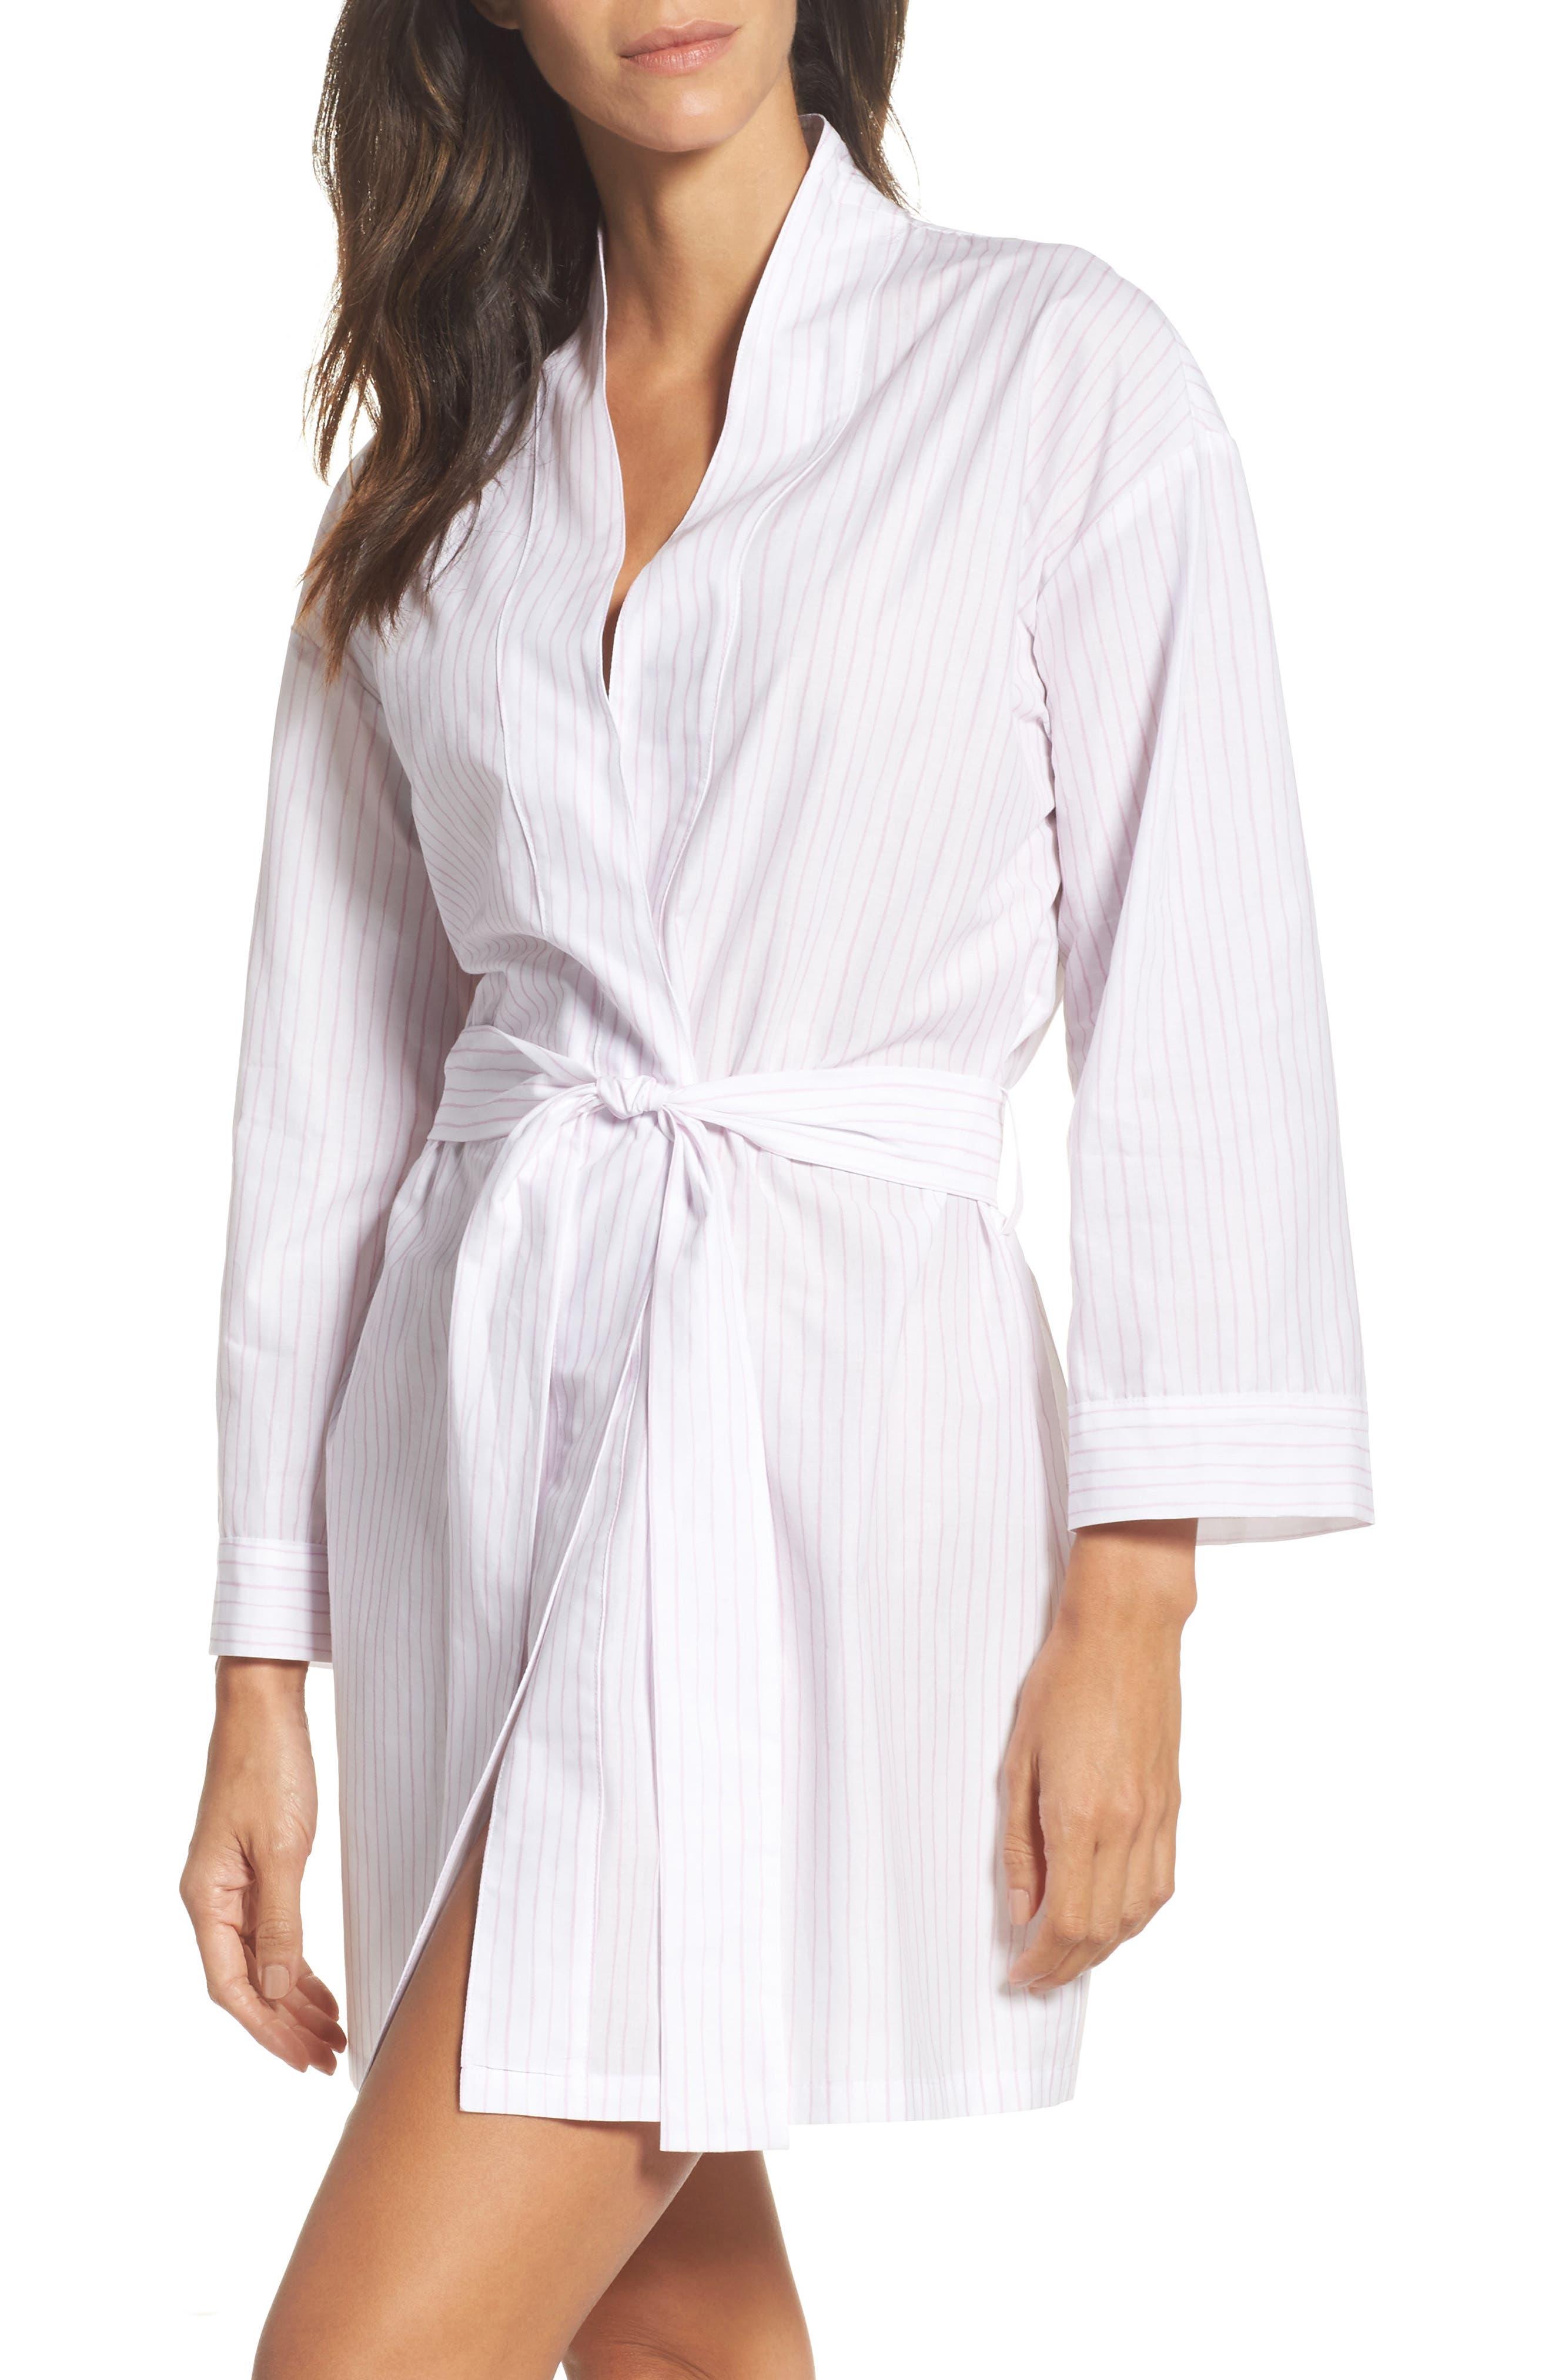 Alternate Image 1 Selected - Pour Les Femmes Stripe Robe